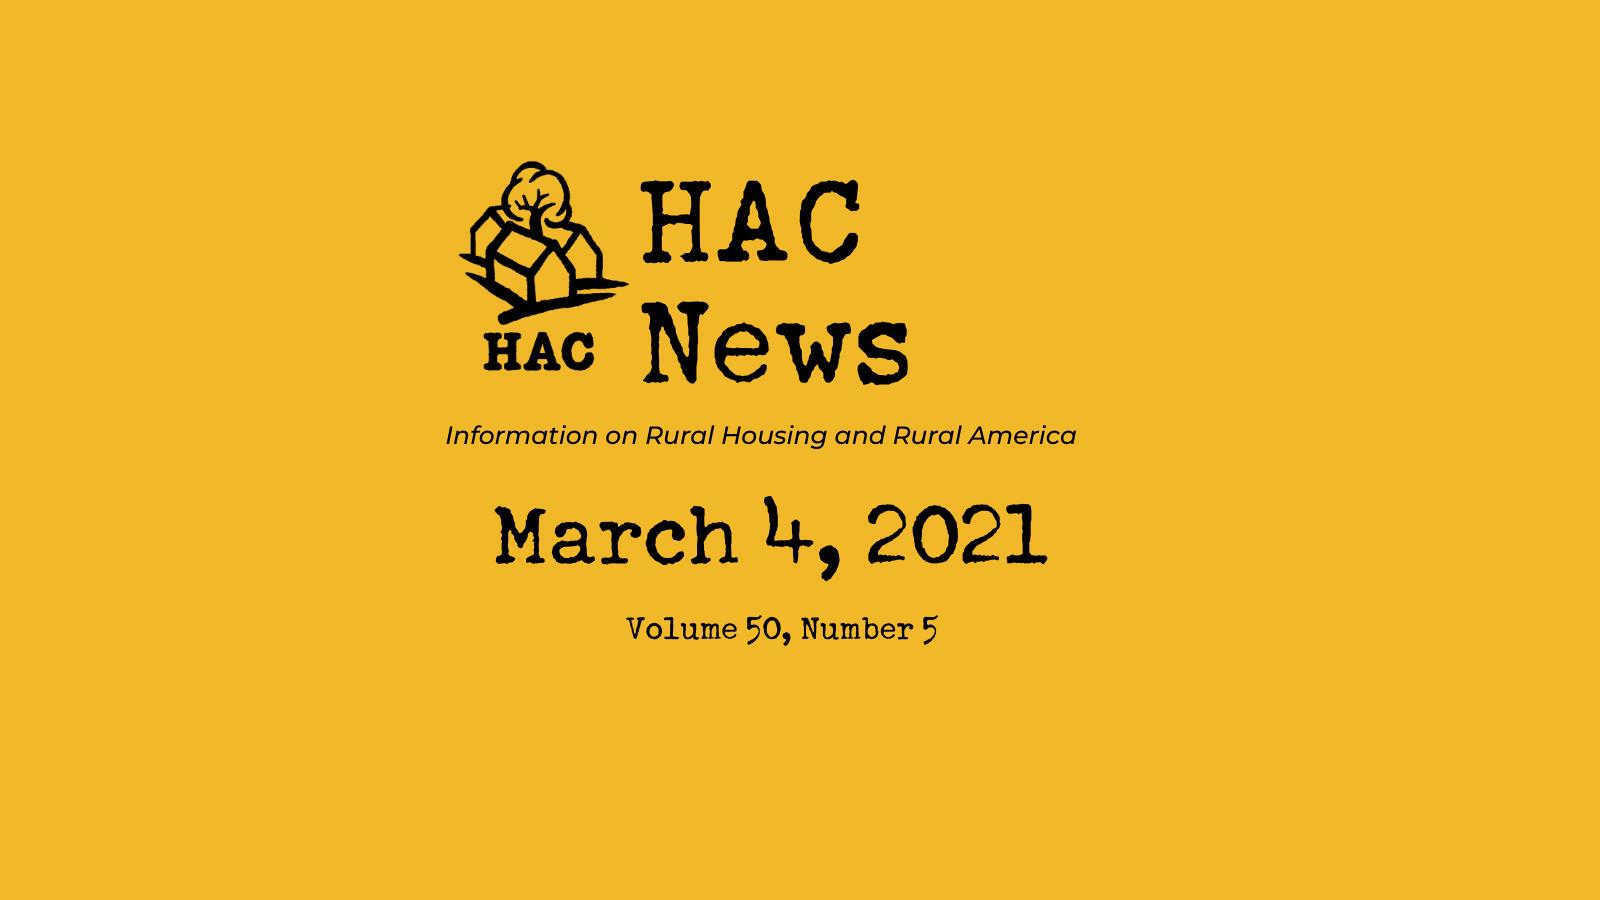 HAC News - 3/4/2021